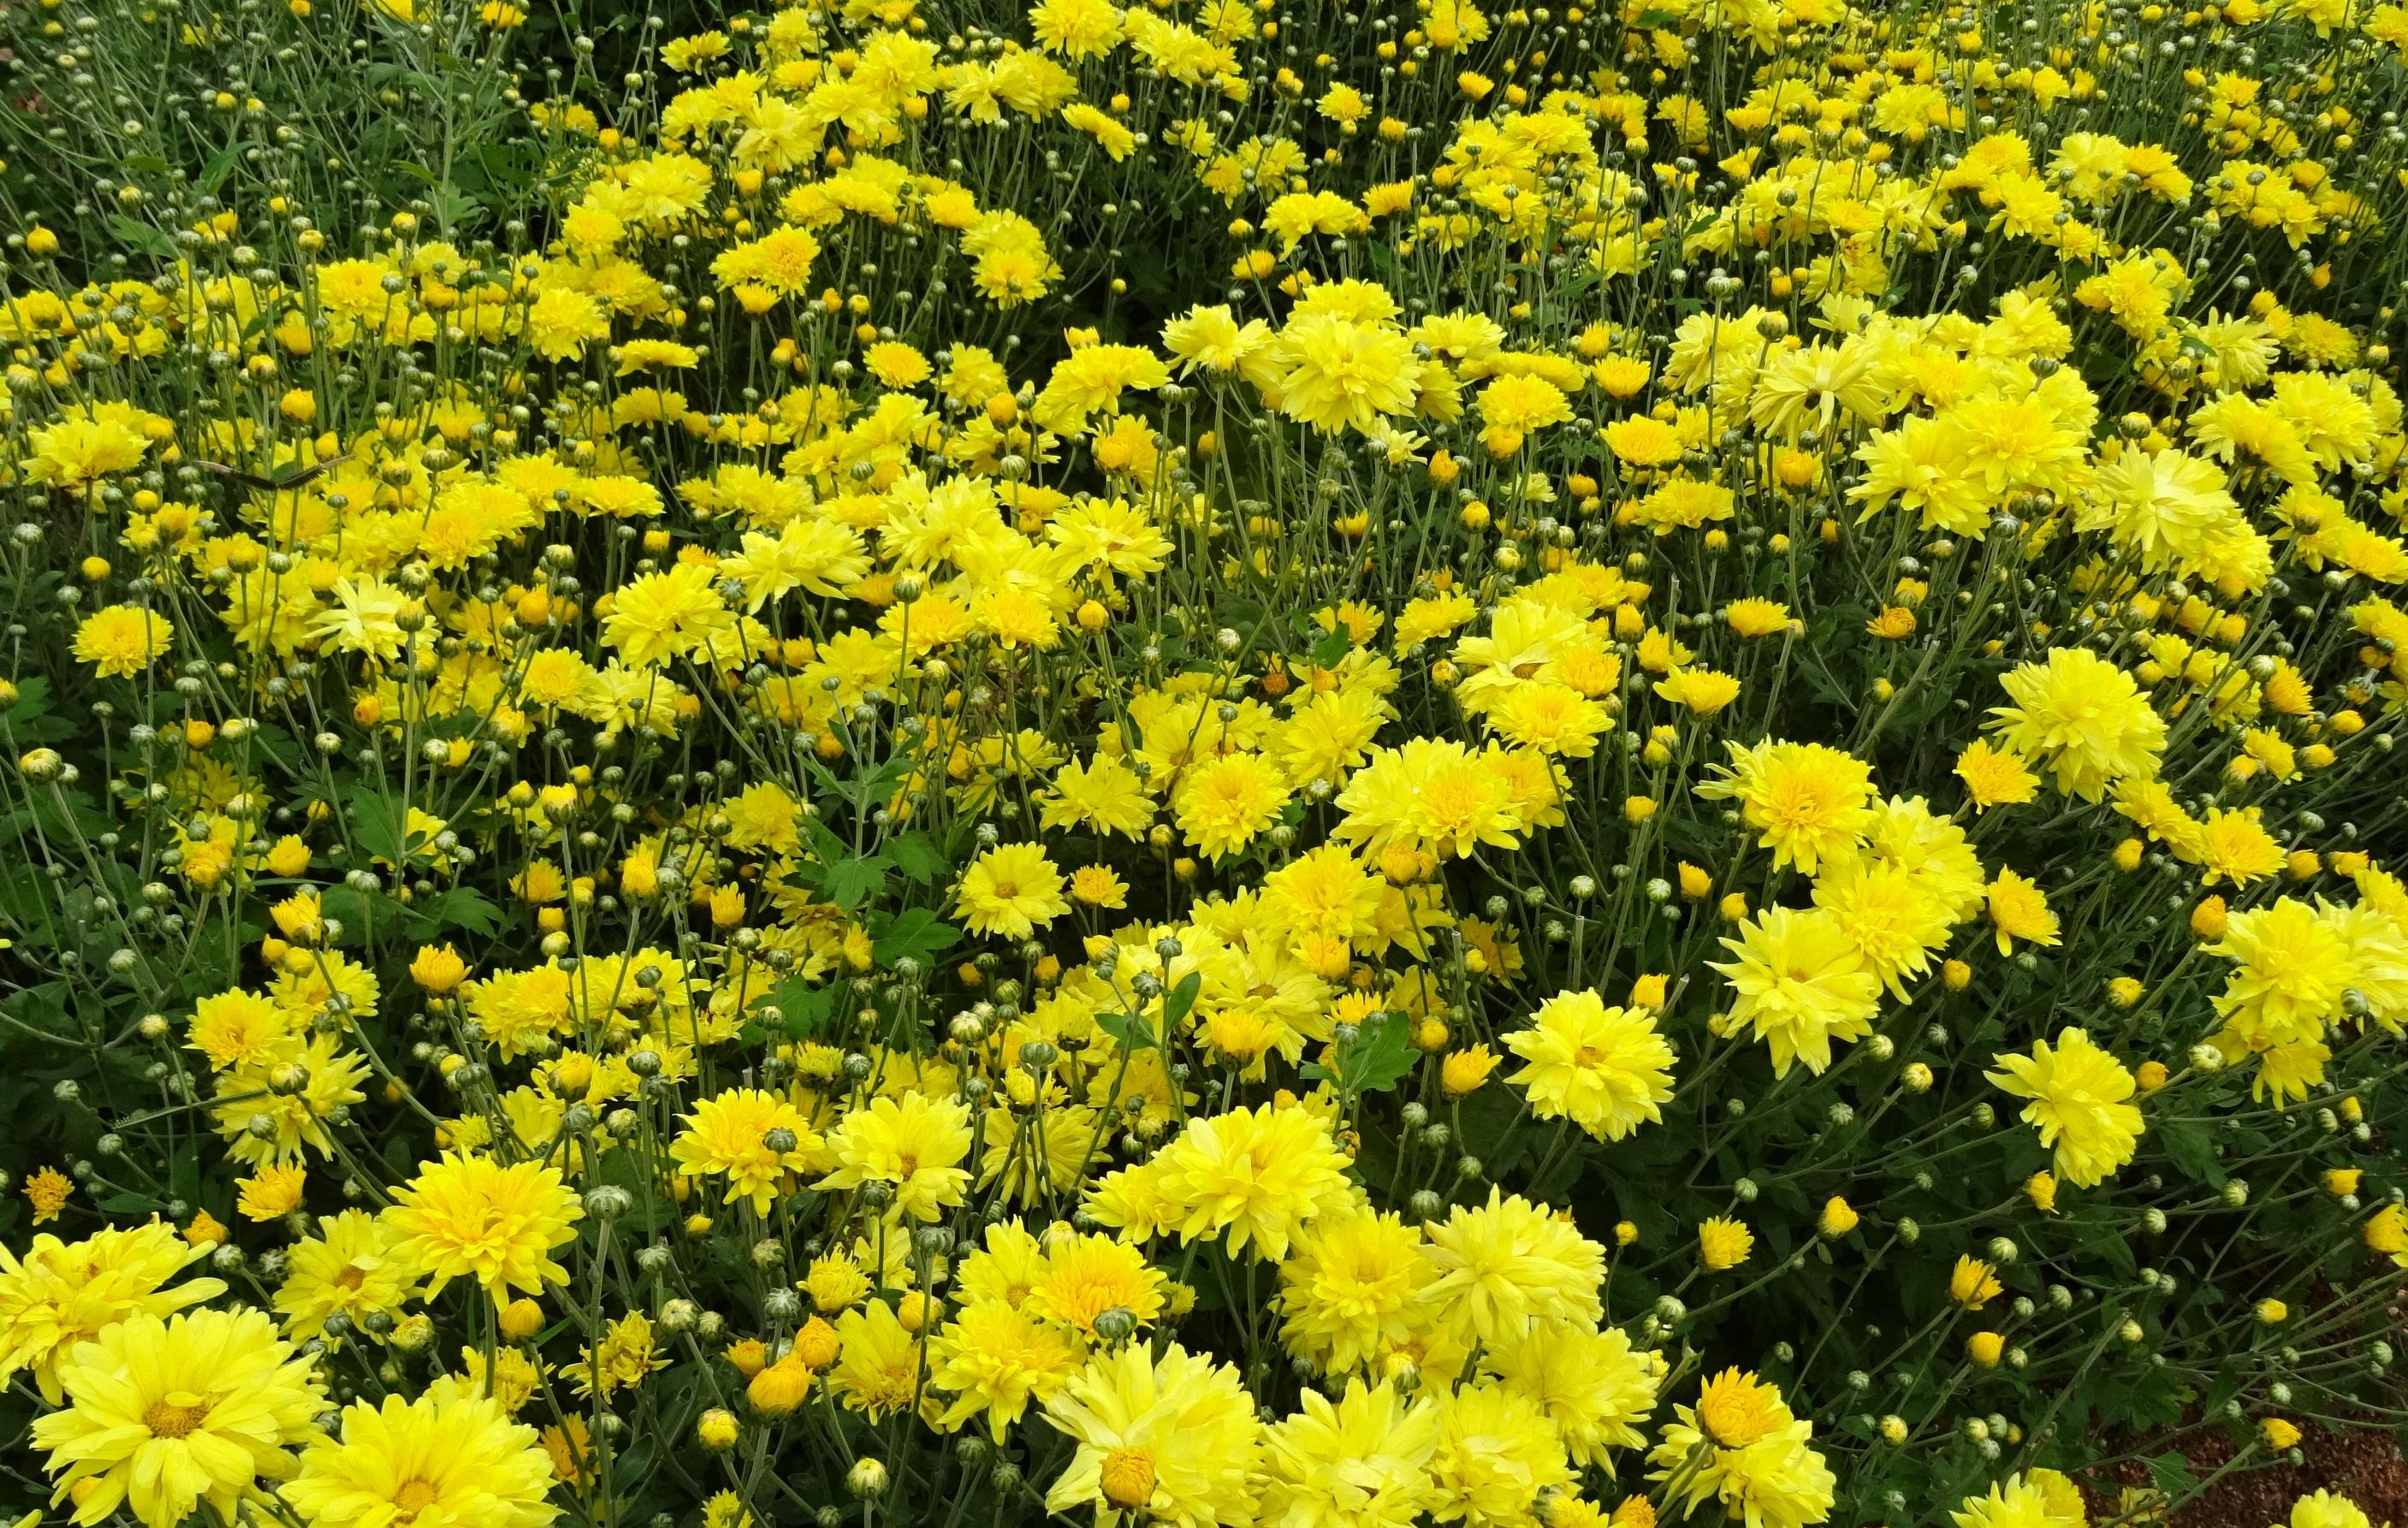 Free images blossom meadow flower bloom yellow flora blossom plant meadow flower bloom yellow flora wildflower shrub asteraceae india annual chrysanthemum flowering tansy flowering mightylinksfo